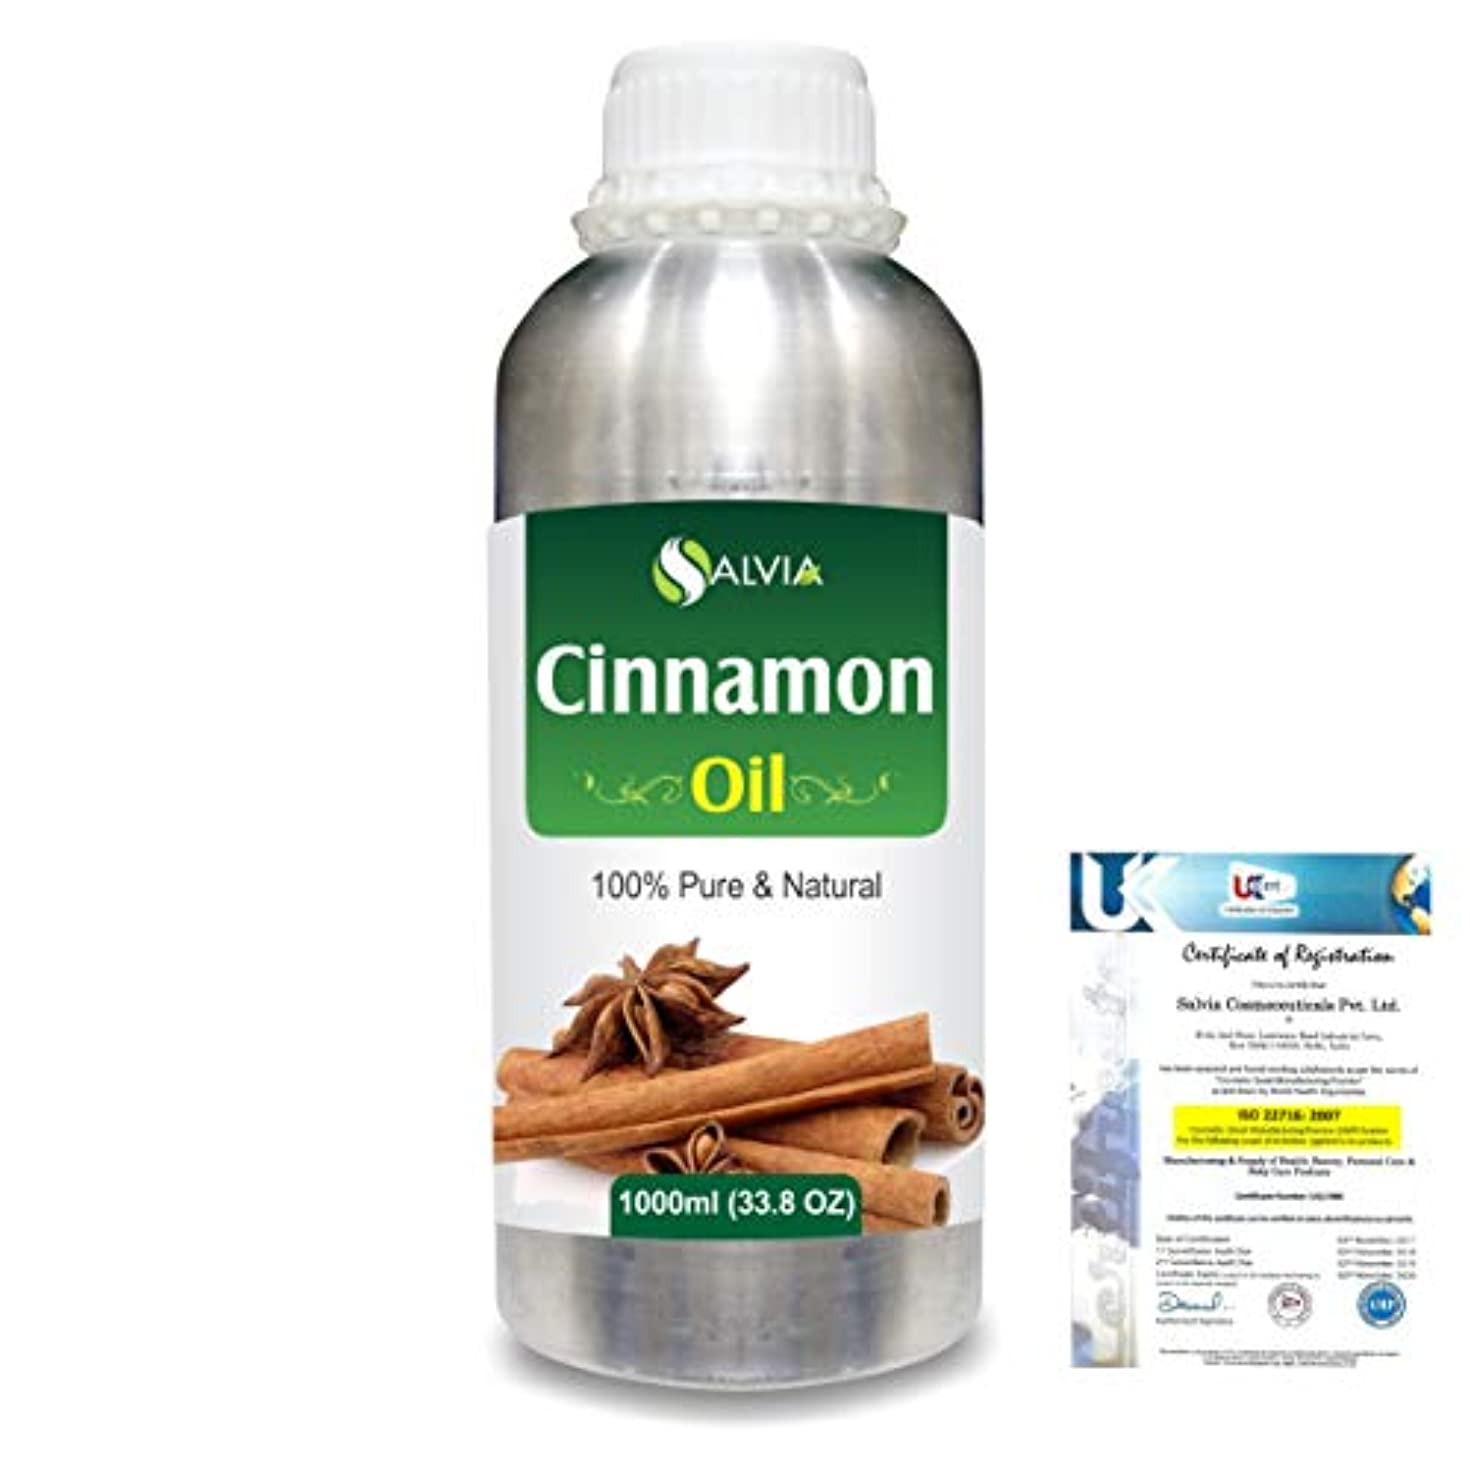 Cinnamon (Cinnamomum Cassia) 100% Natural Pure Essential Oil 1000ml/33.8fl.oz.